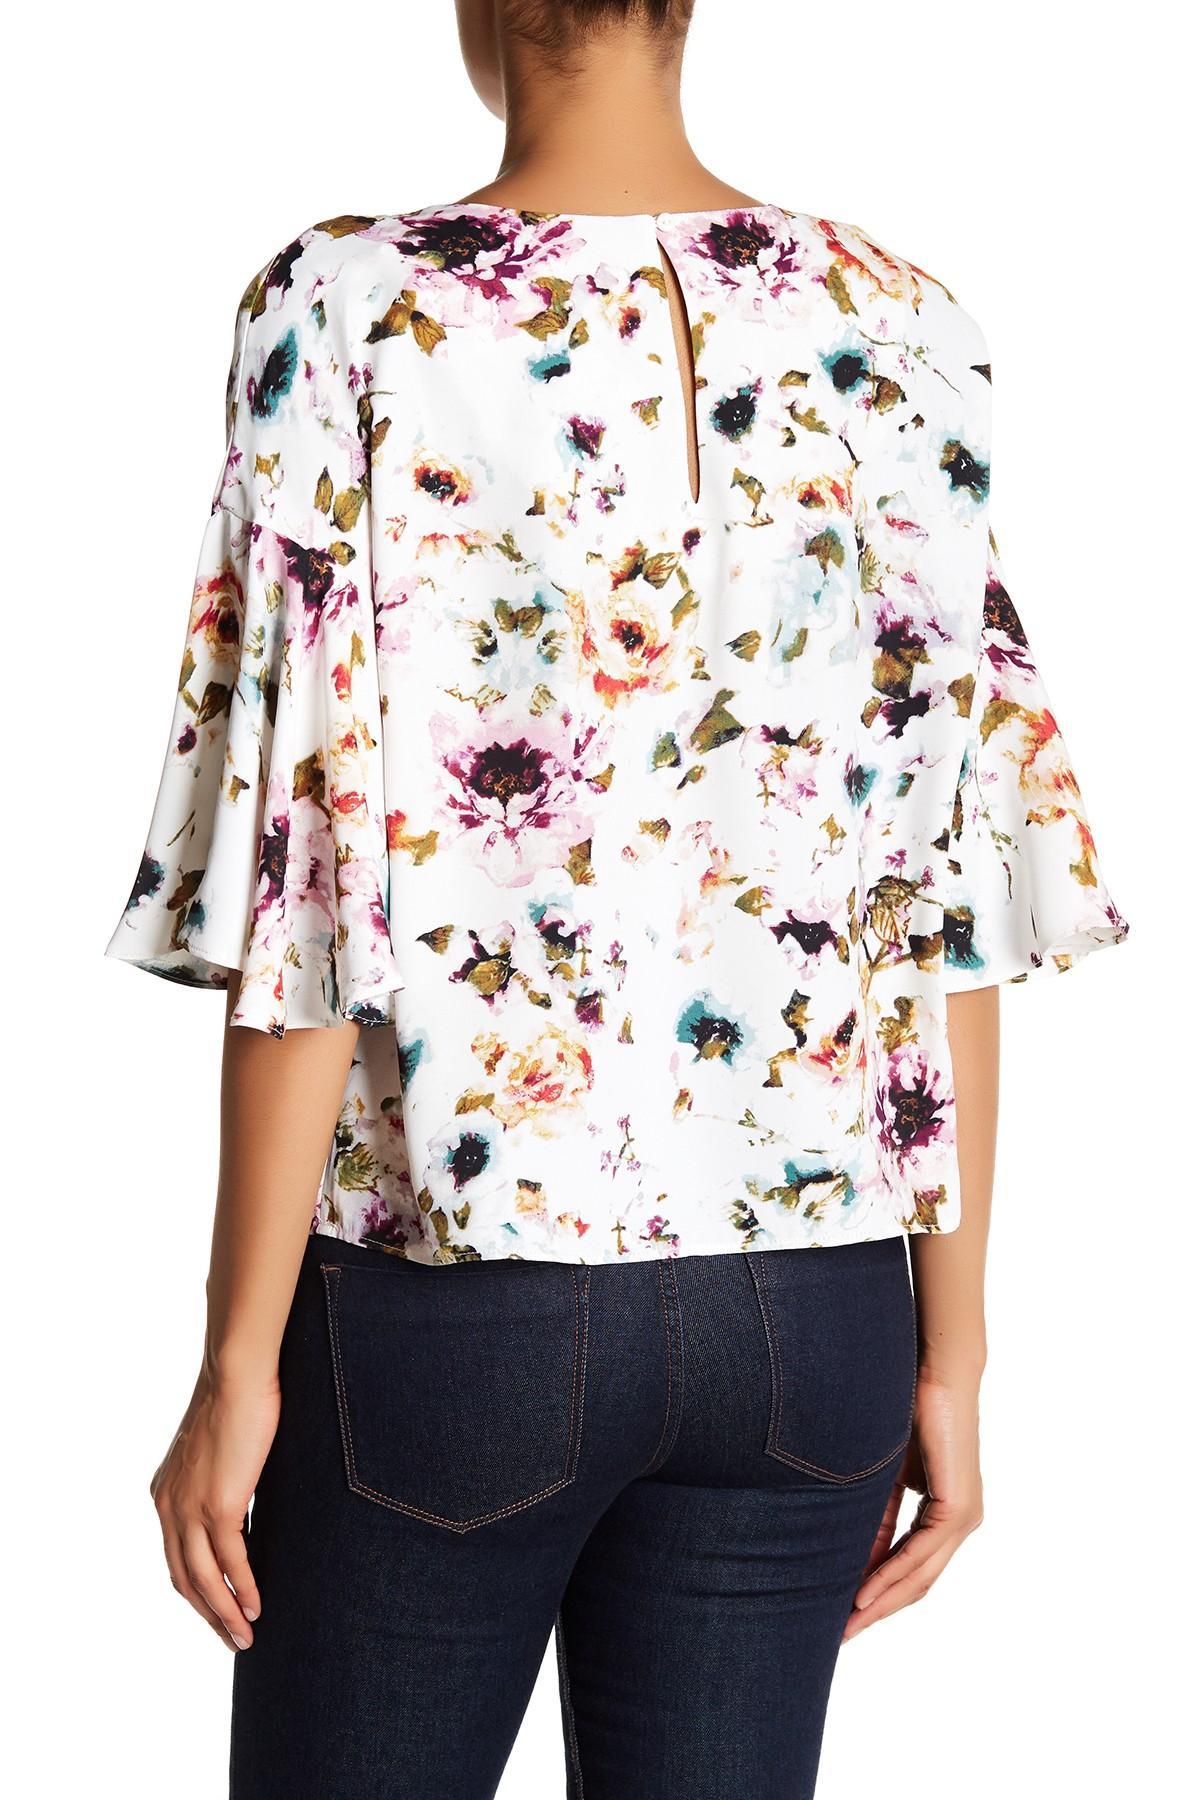 Adrienne Vittadini Floral Bell Sleeve Blouse Lyst